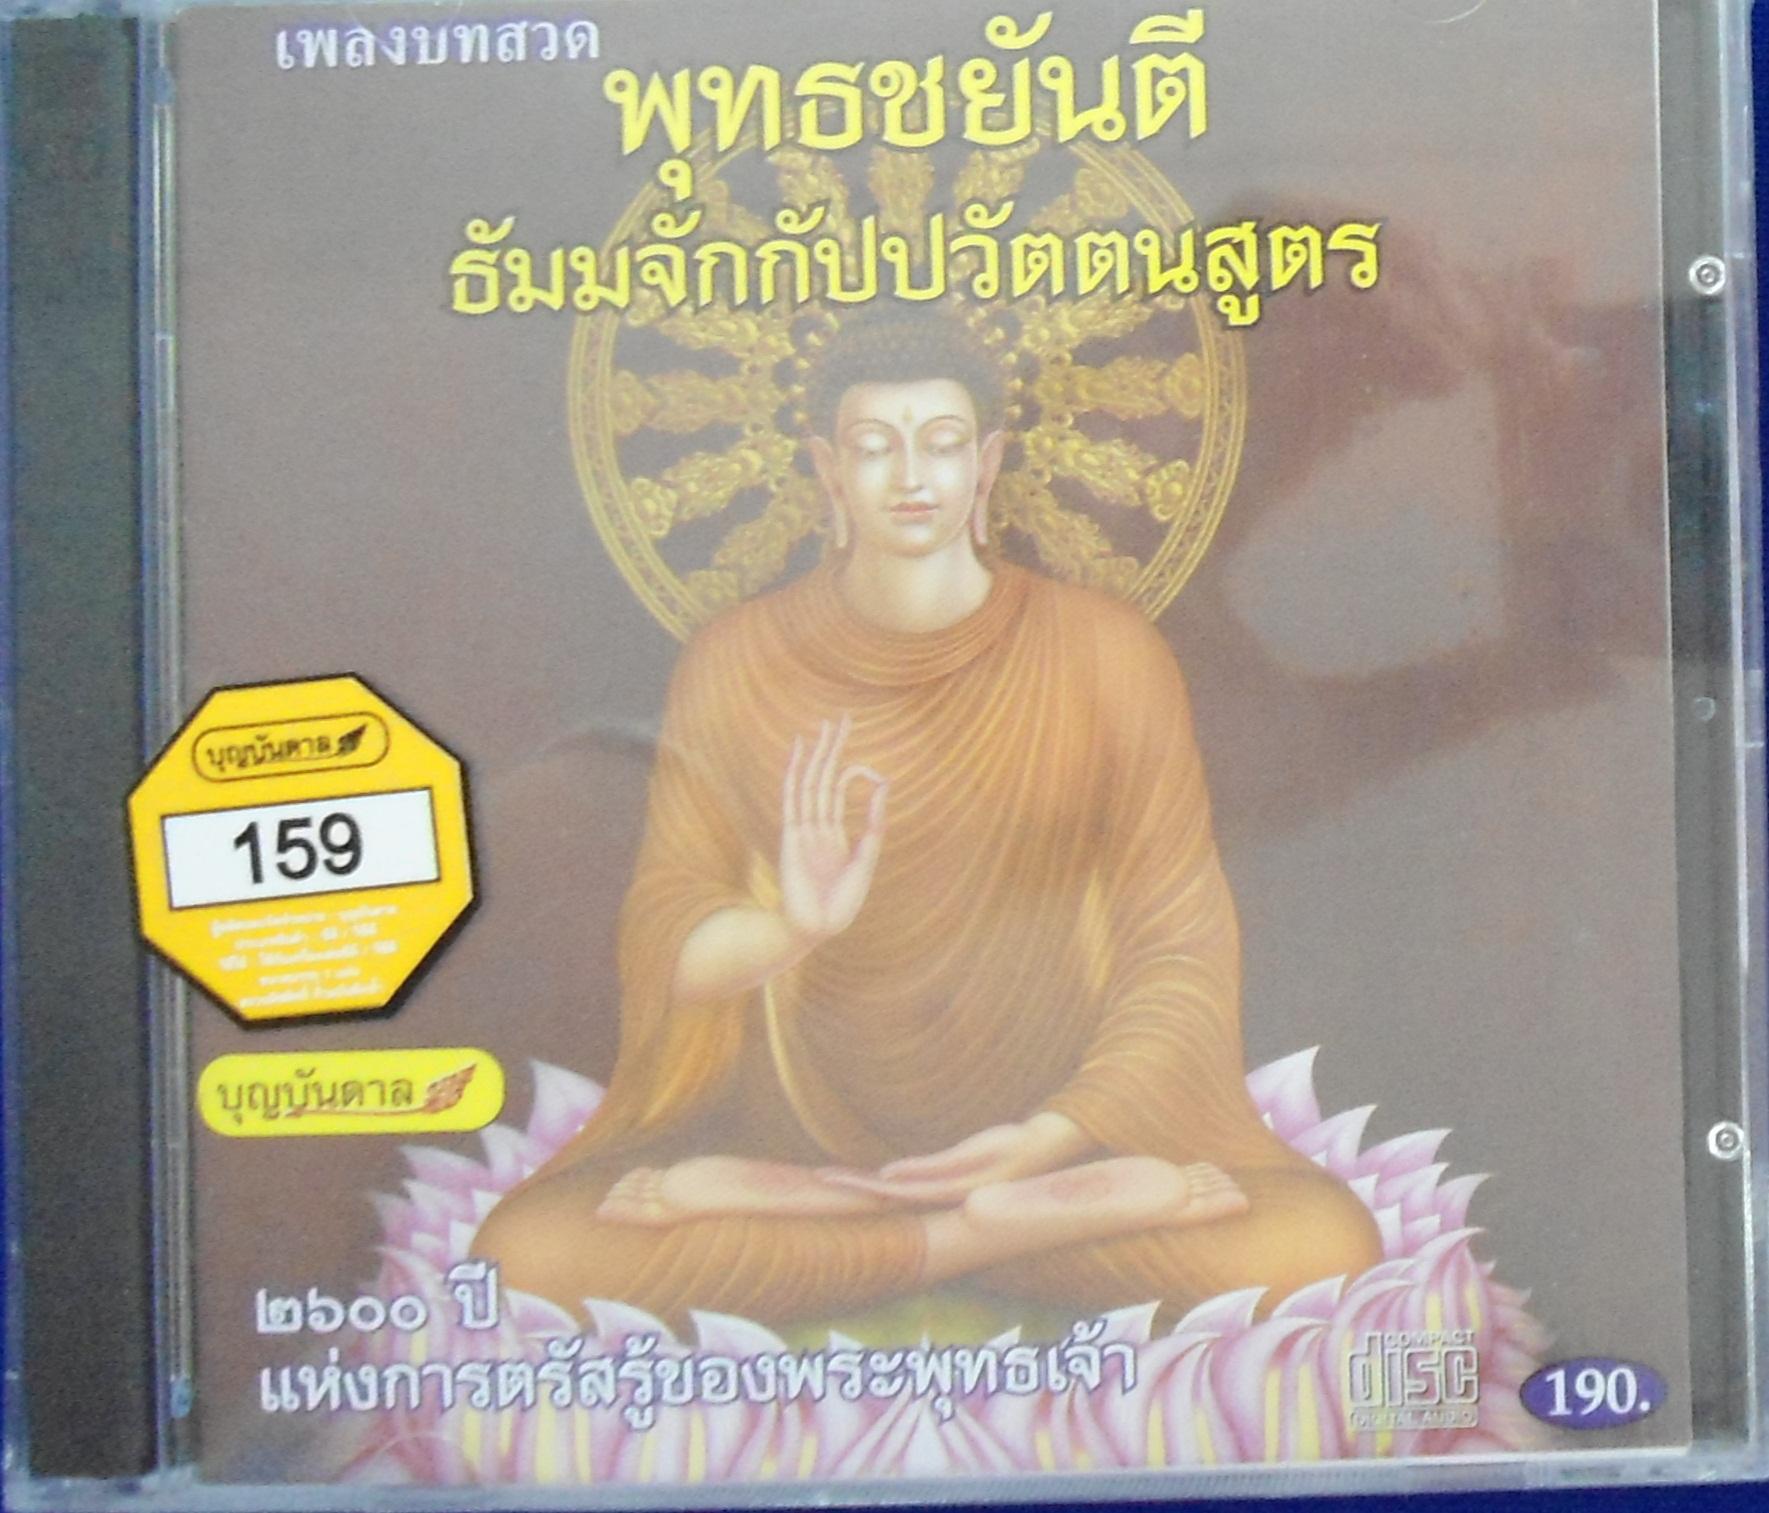 CD เพลงบทสวดพุทธชยันตี ธัมมจักกัปปวัตตนสูตร